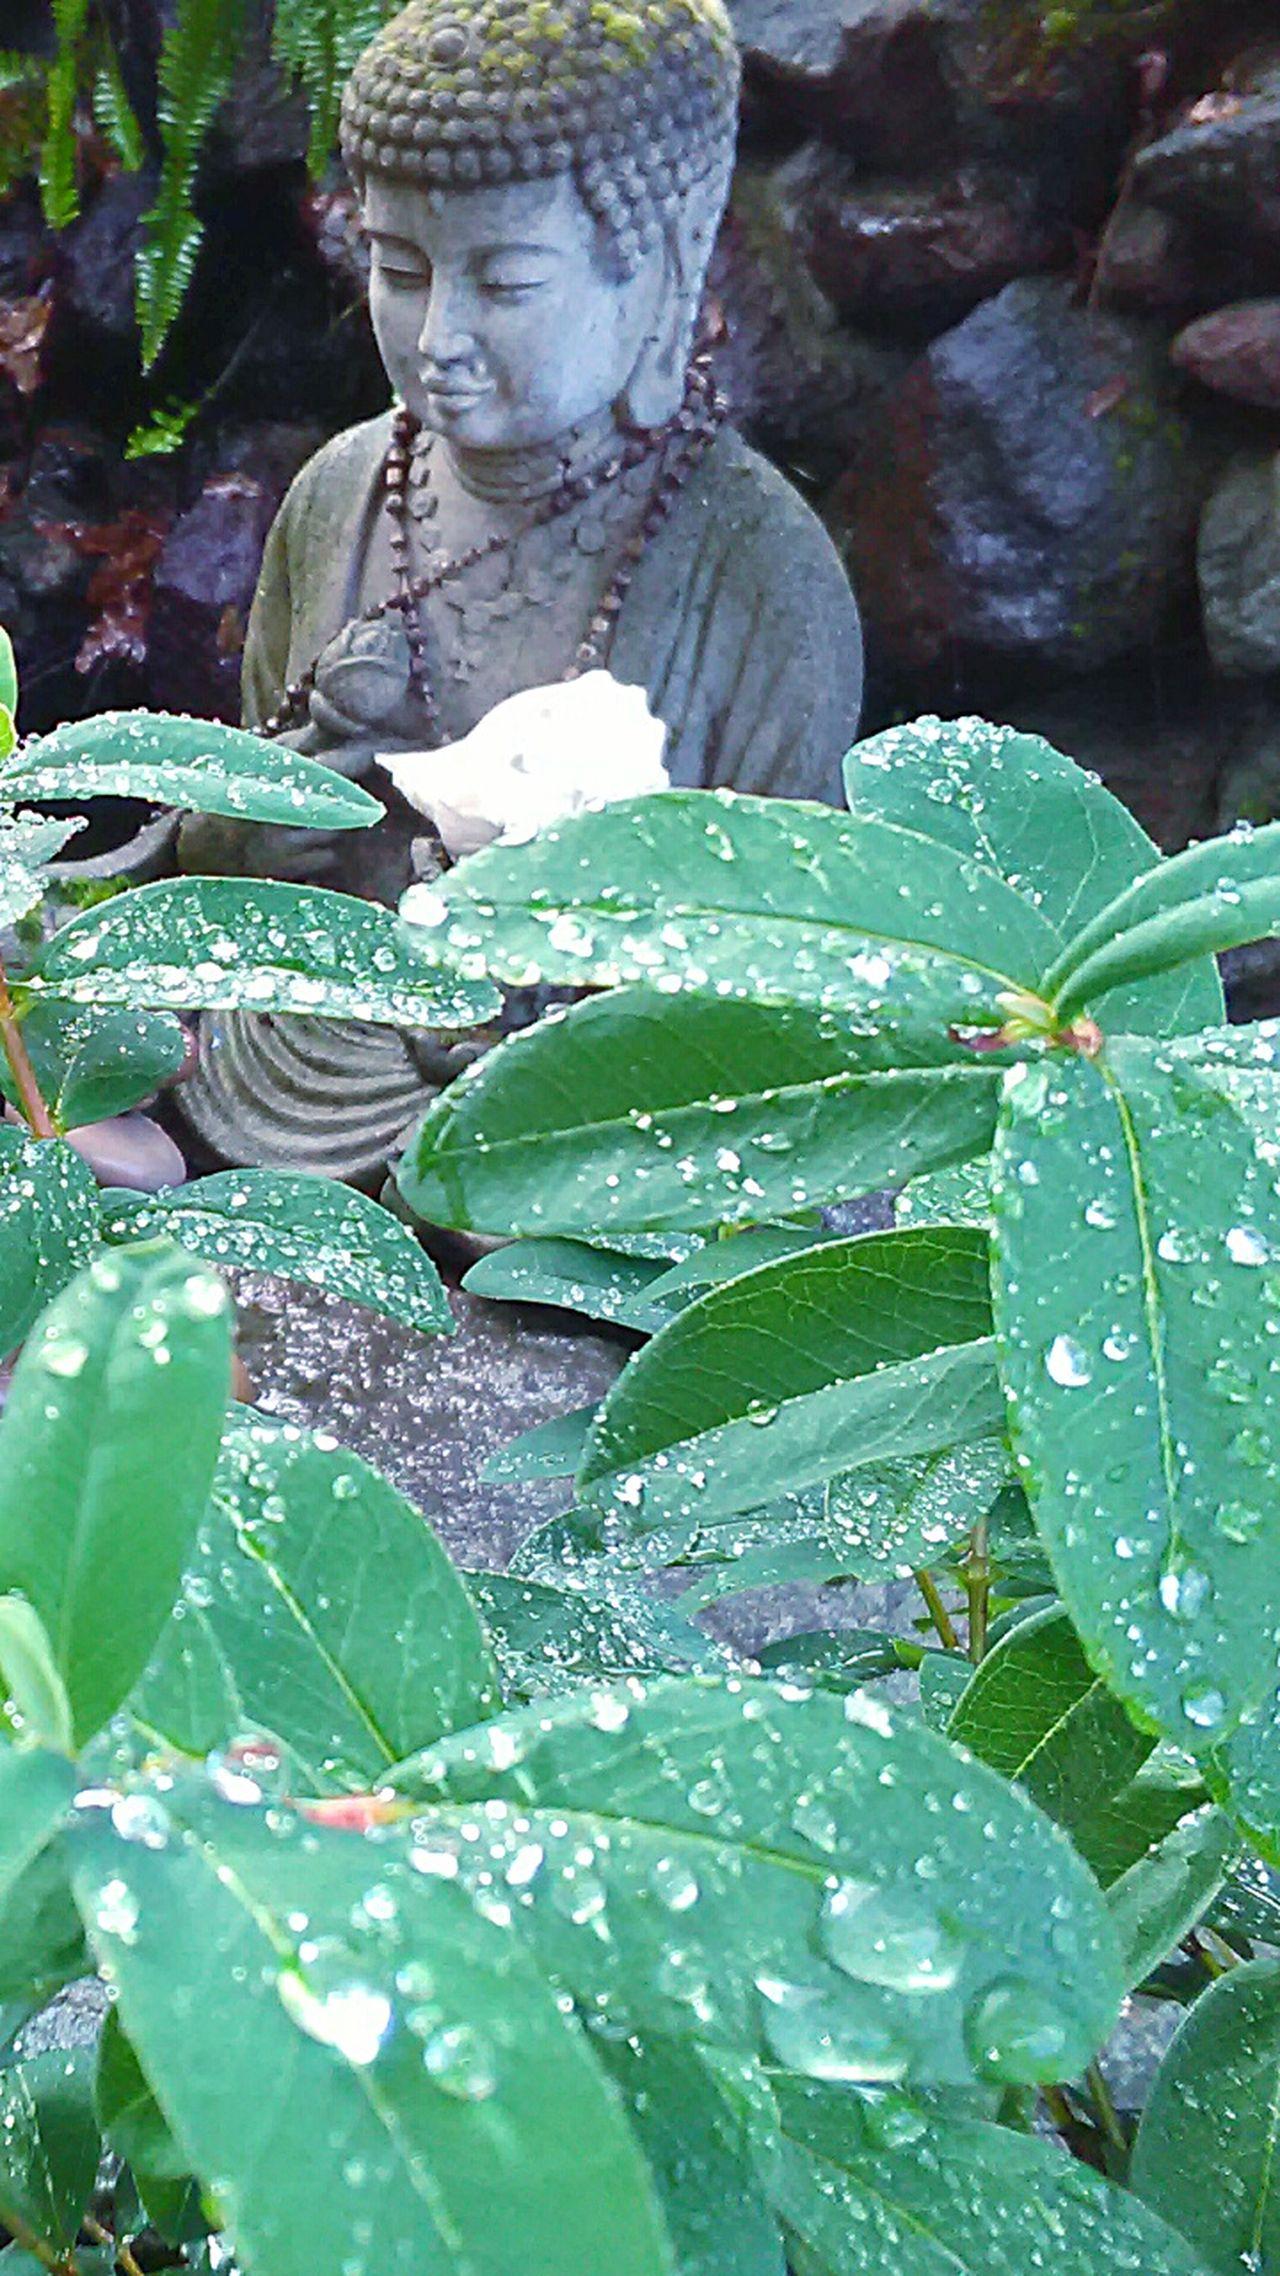 EyeEm Nature Lover Water Drops Garden Photography Rainy Days☔ My Photography My Point Of View Zen Garden Rain Drops Plants 🌱 Rocks And Water Leaves🌿 Rain Drops On Leaves Plant Photography Meditation Garden Garden Statue